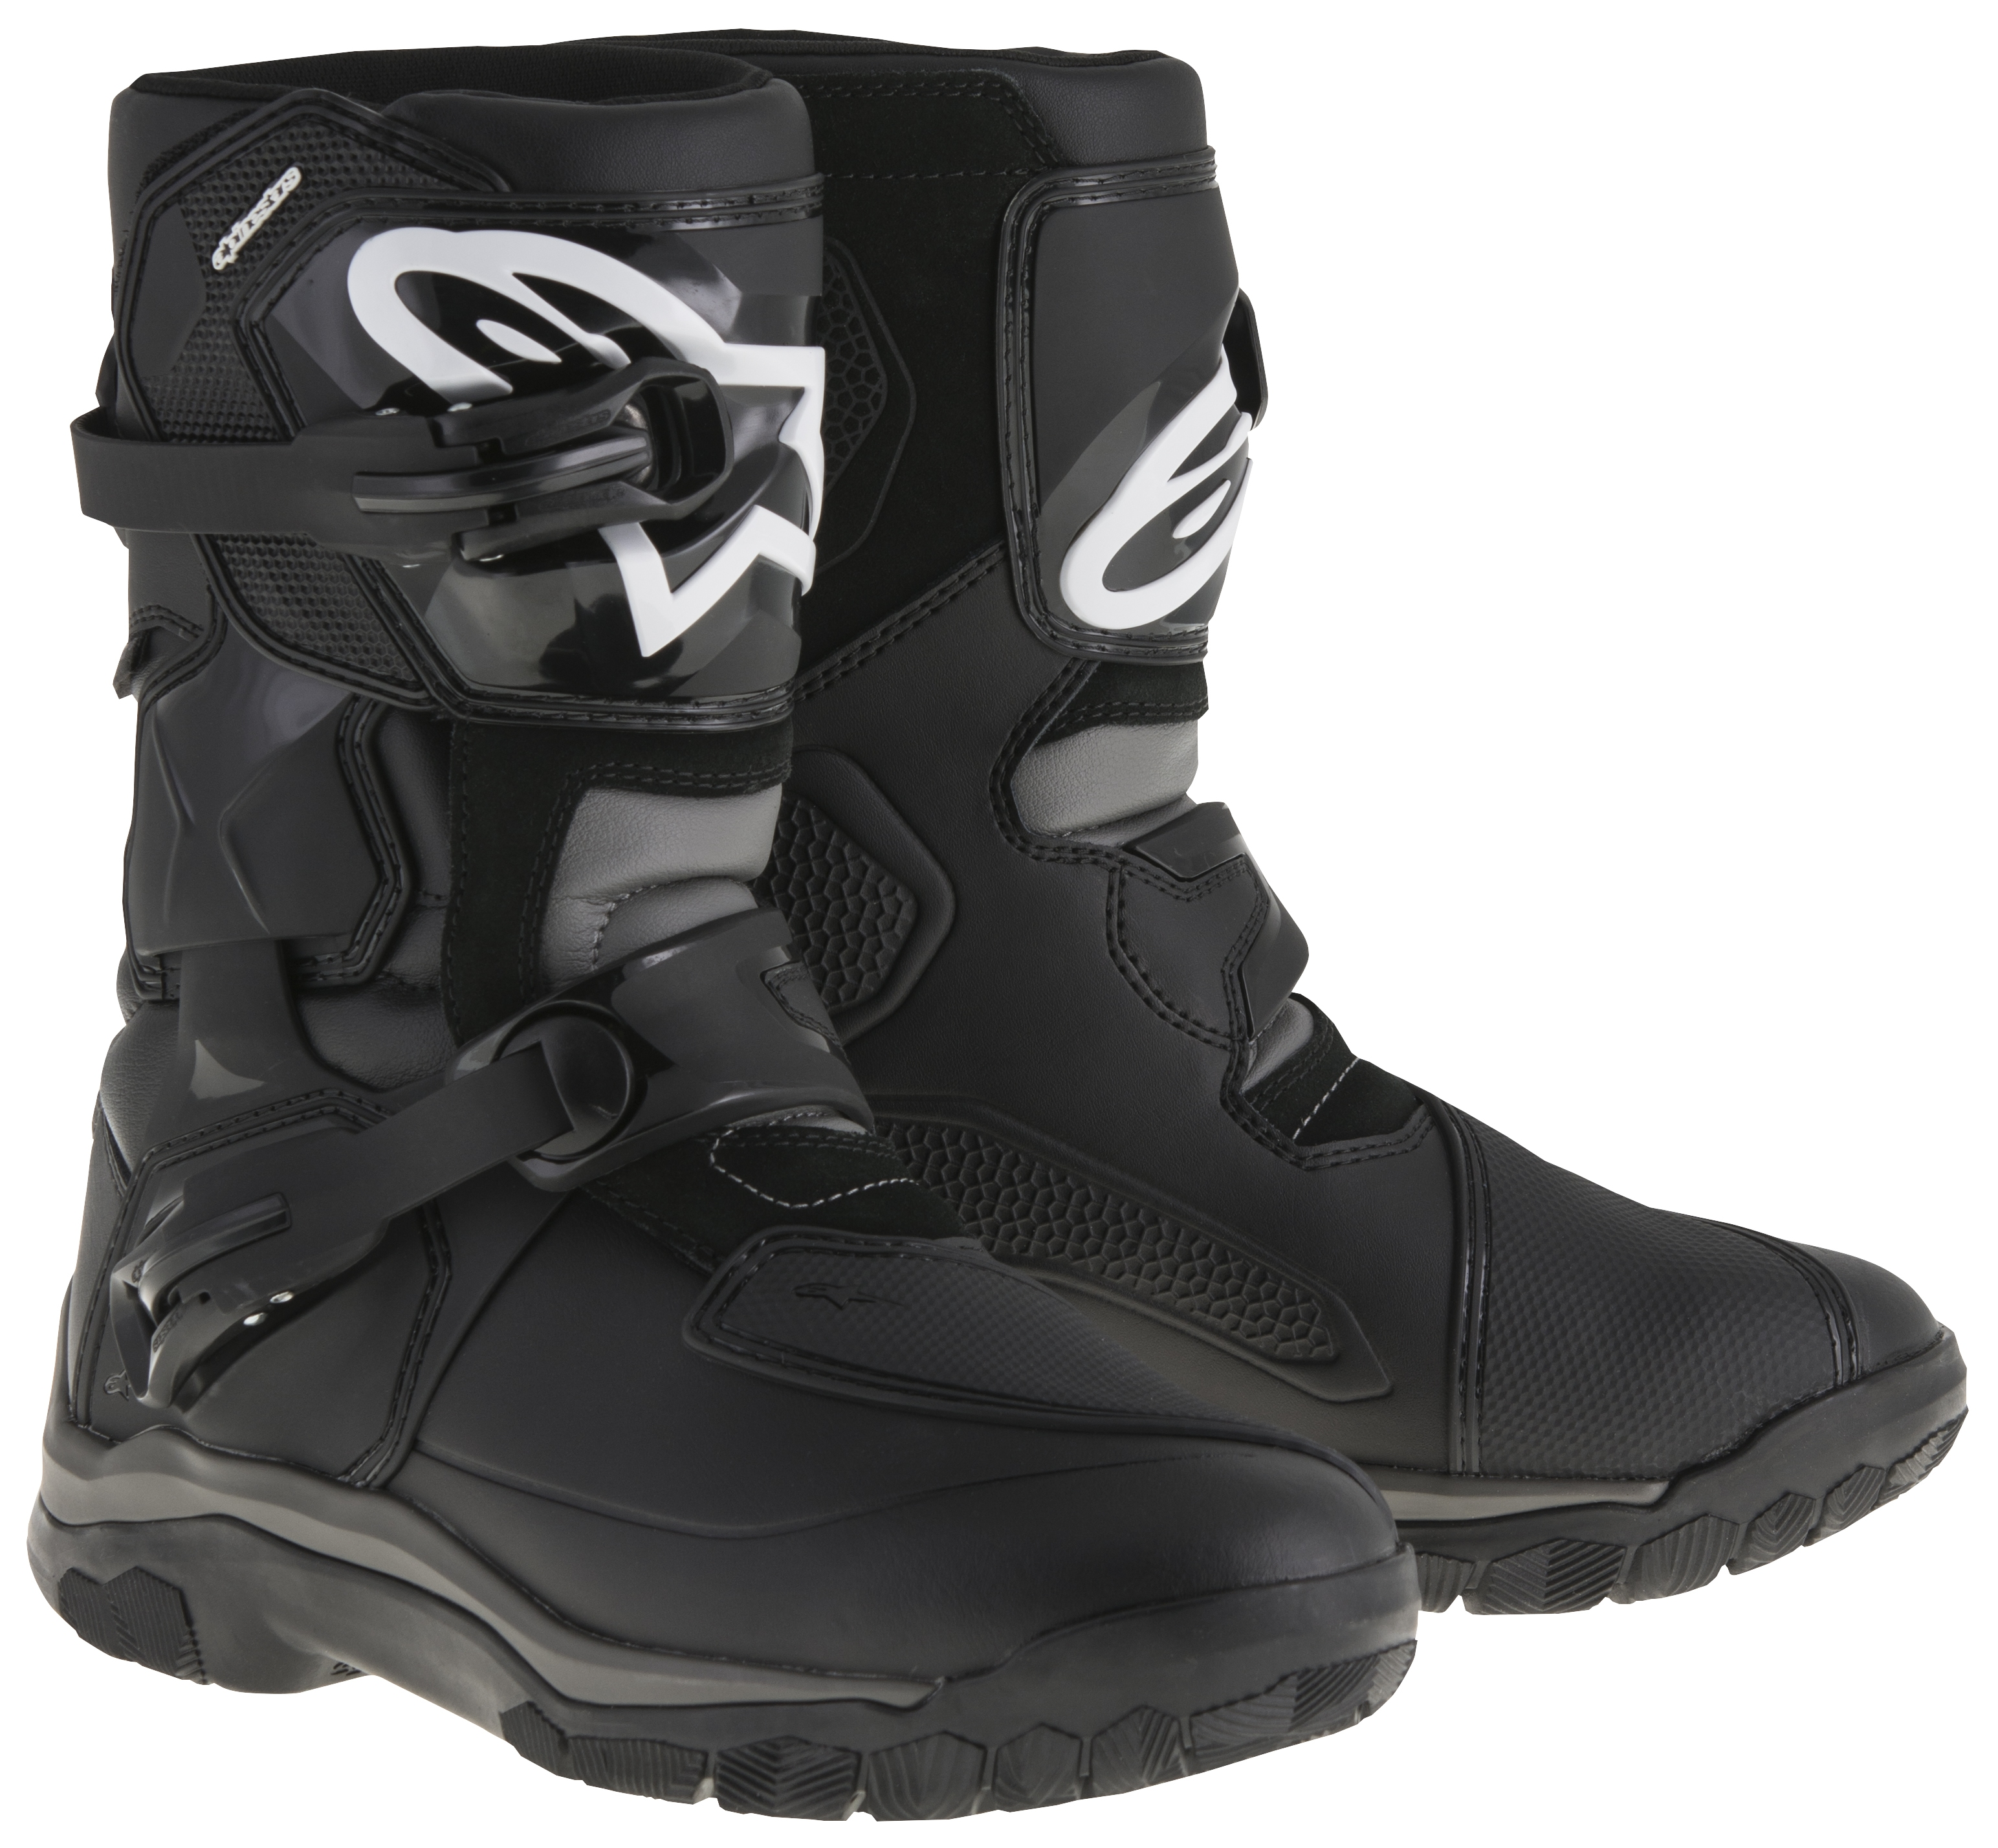 Alpine Motorcycle Gear >> Alpinestars Belize Drystar Boots - RevZilla